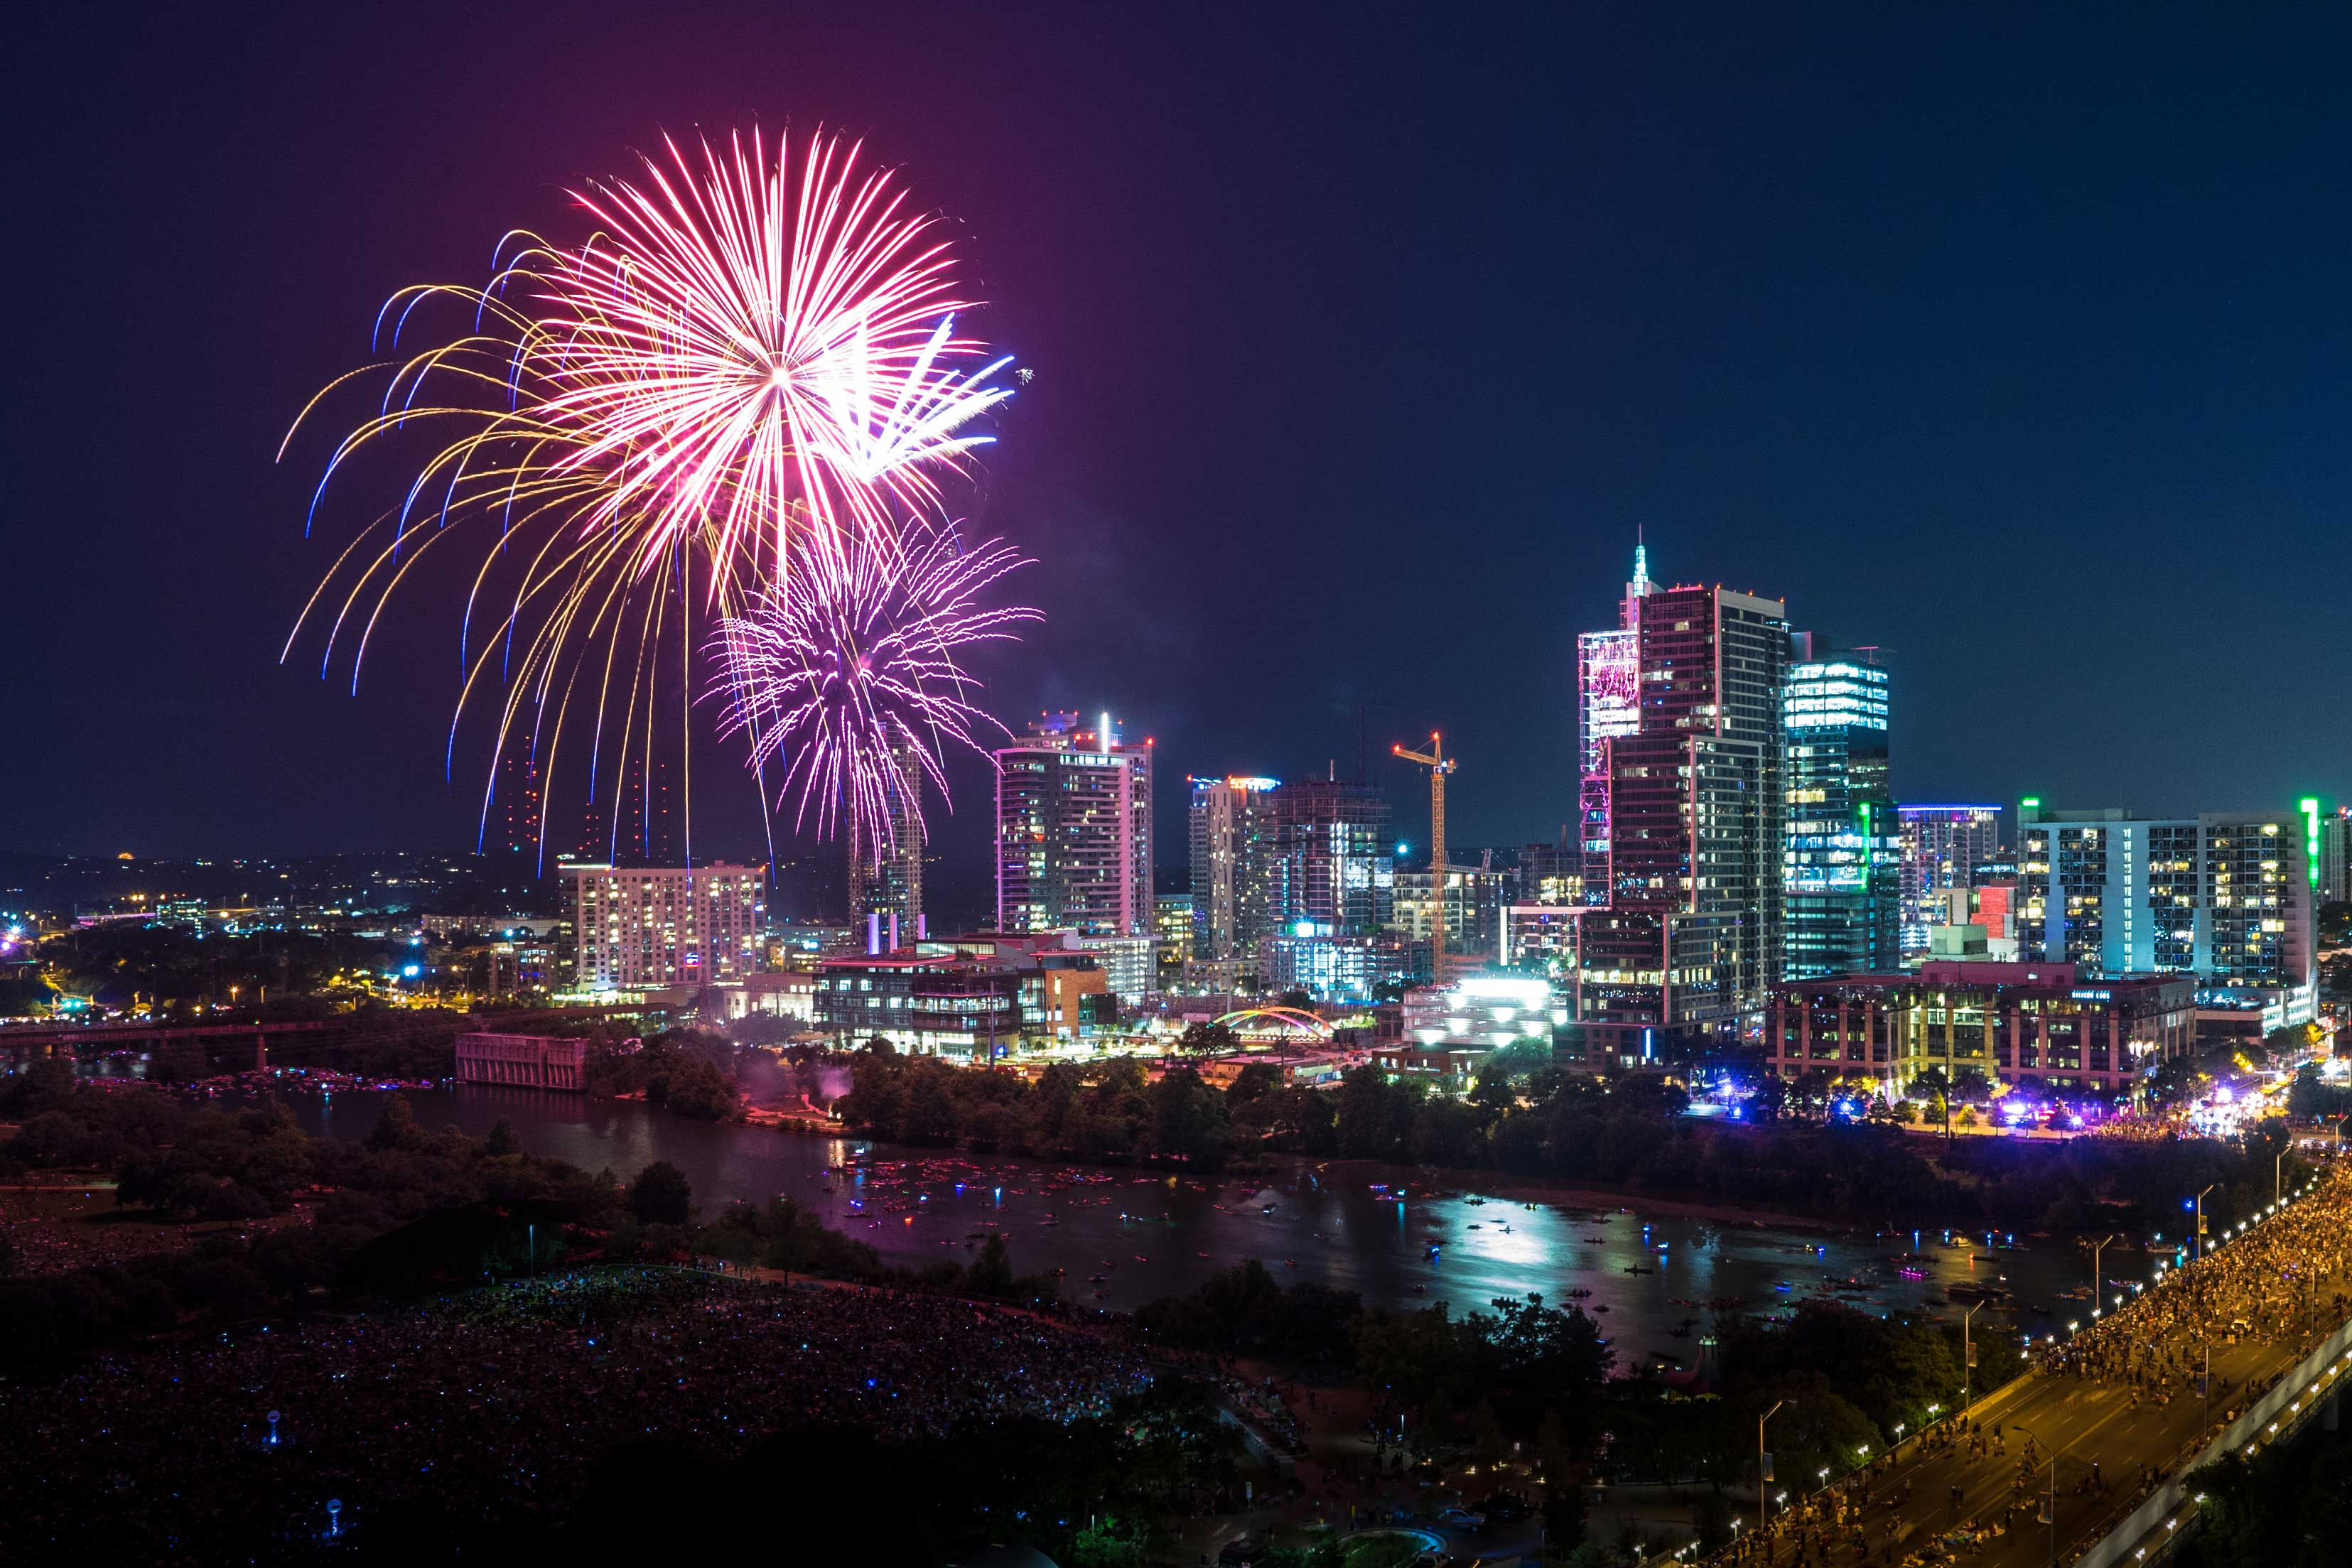 Downtown Austin Texas July 4 2017